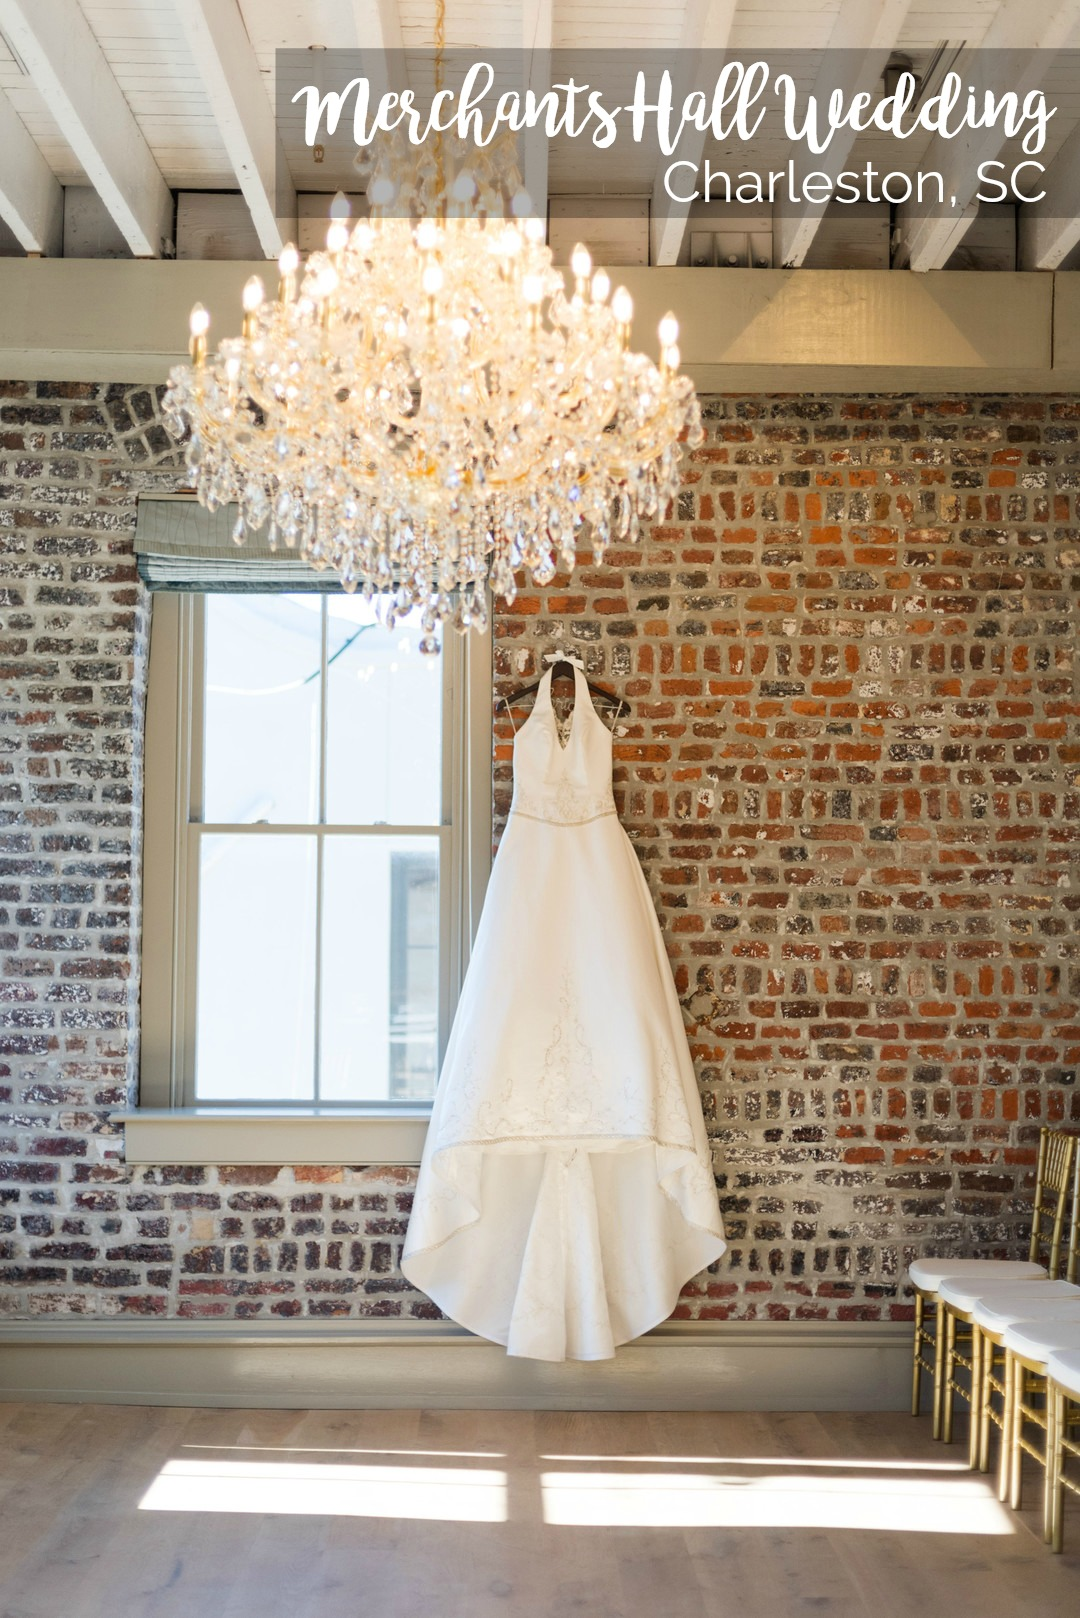 Lydia + Seth: Effortless Charleston Charm at Merchants Hall | Palmetto State Weddings | Kingsbridge Photography | Charleston SC wedding | best wedding venues Charleston | neutral wedding ideas